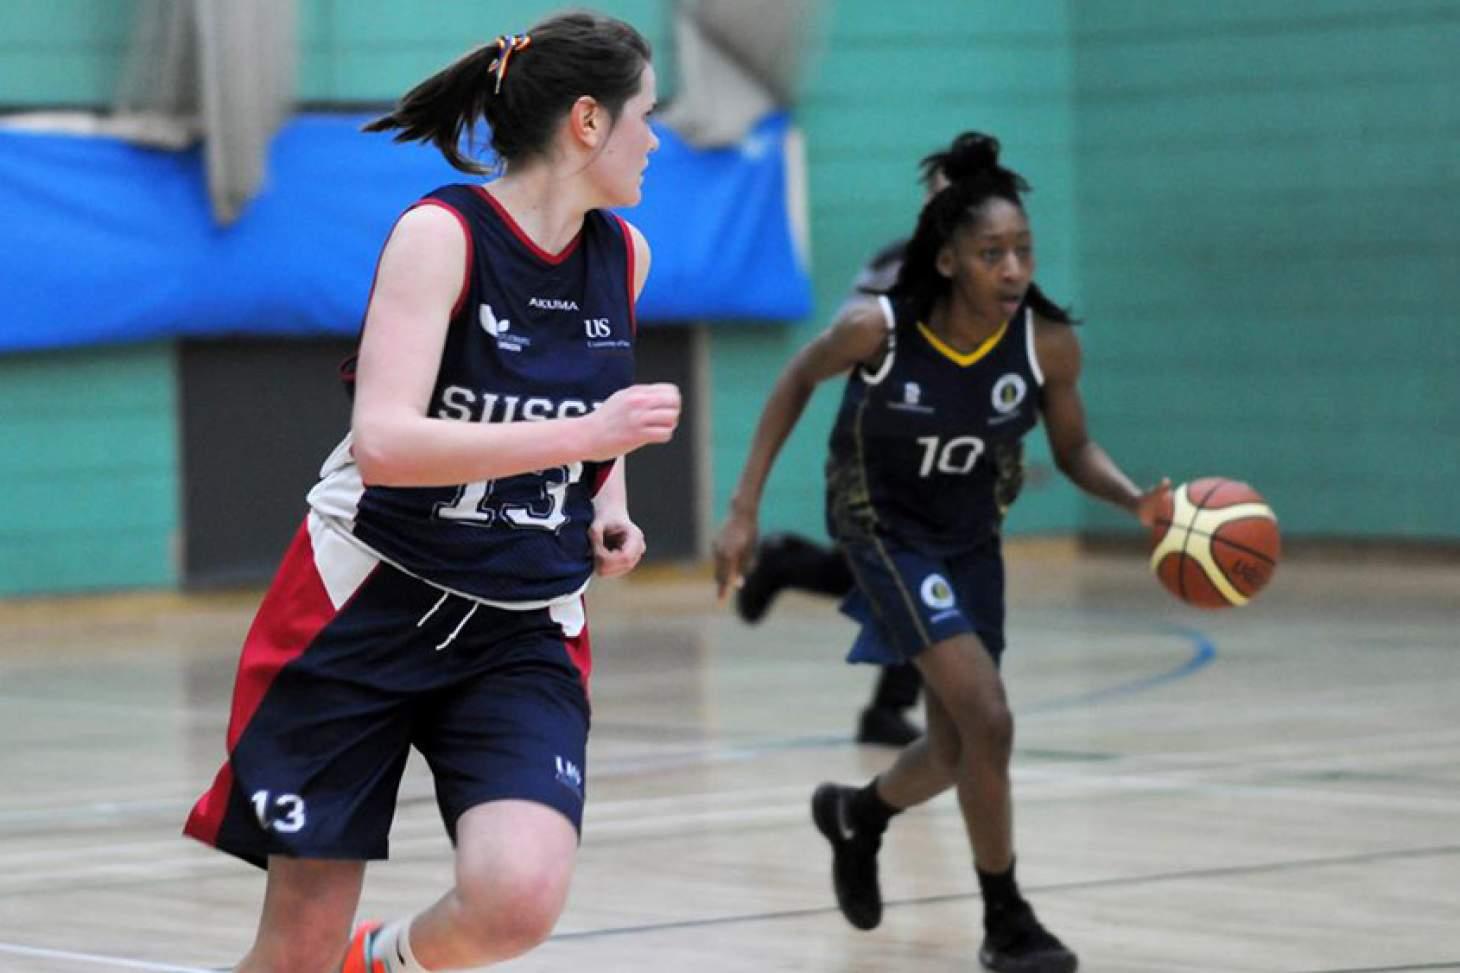 University Of Sussex Sport Centre Indoor basketball court